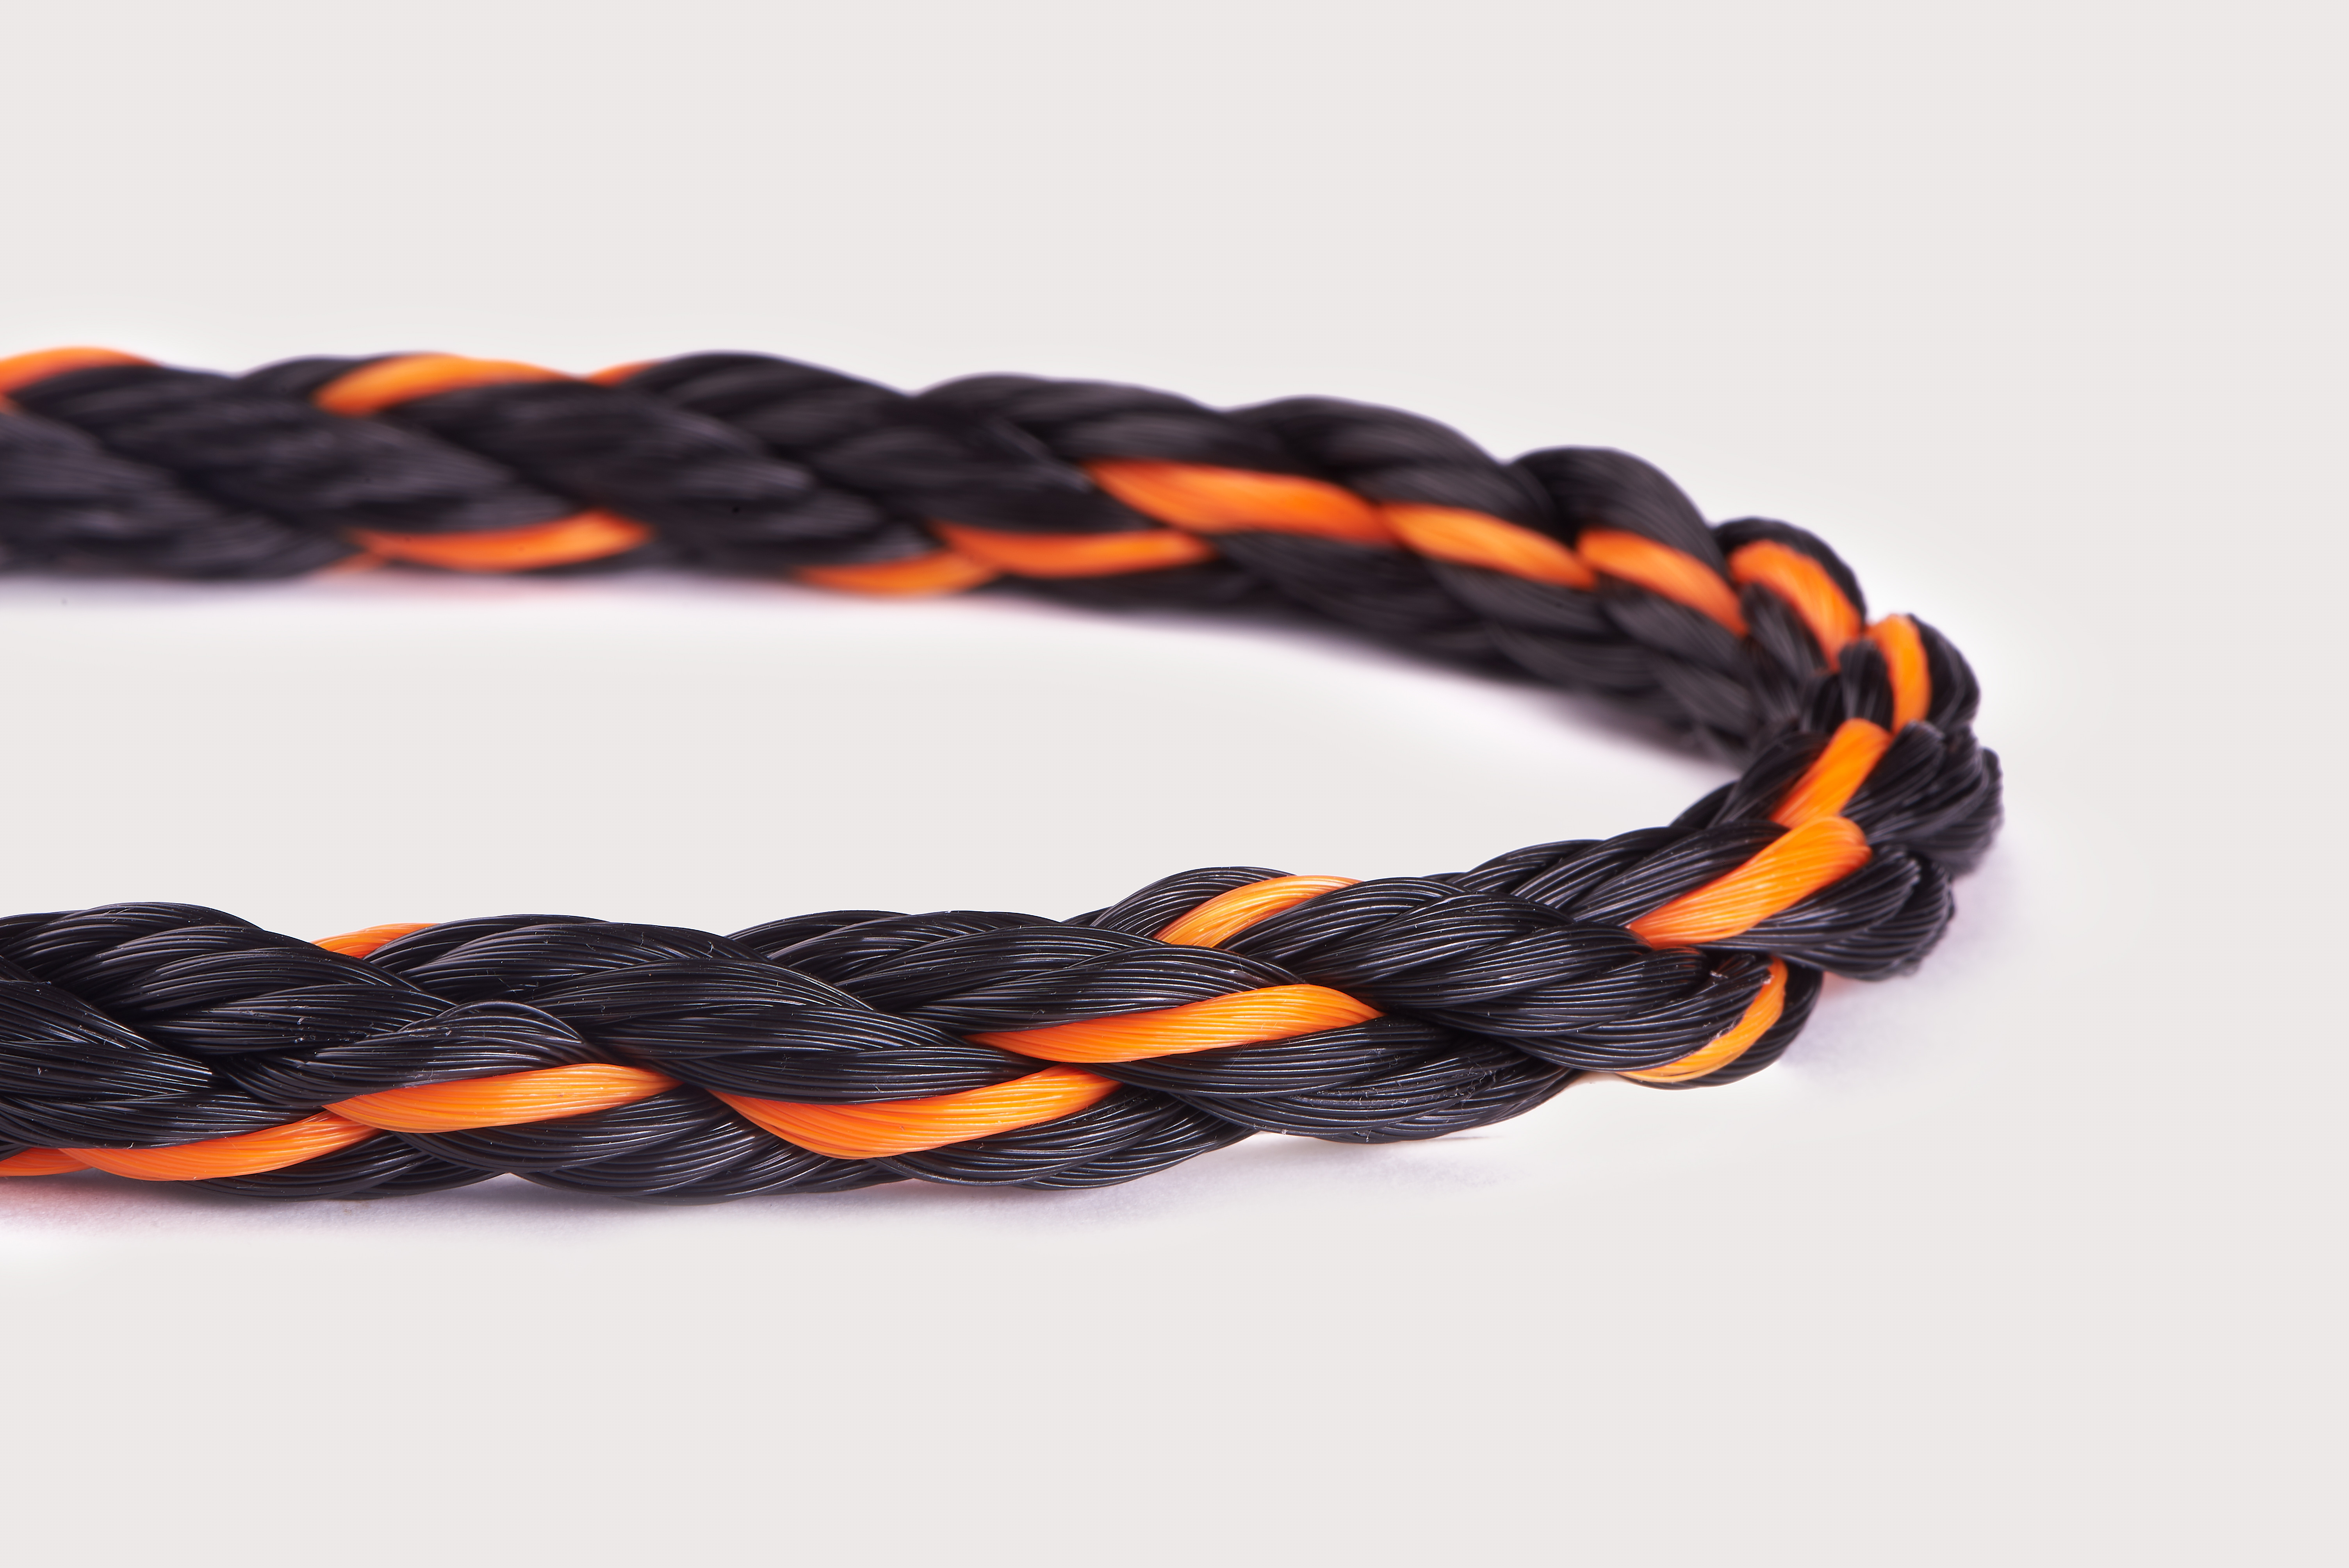 Orion-Cordage-Polylite 3-Strand Monofilament Polypropylene-Black I Orange-Curved226.jpg